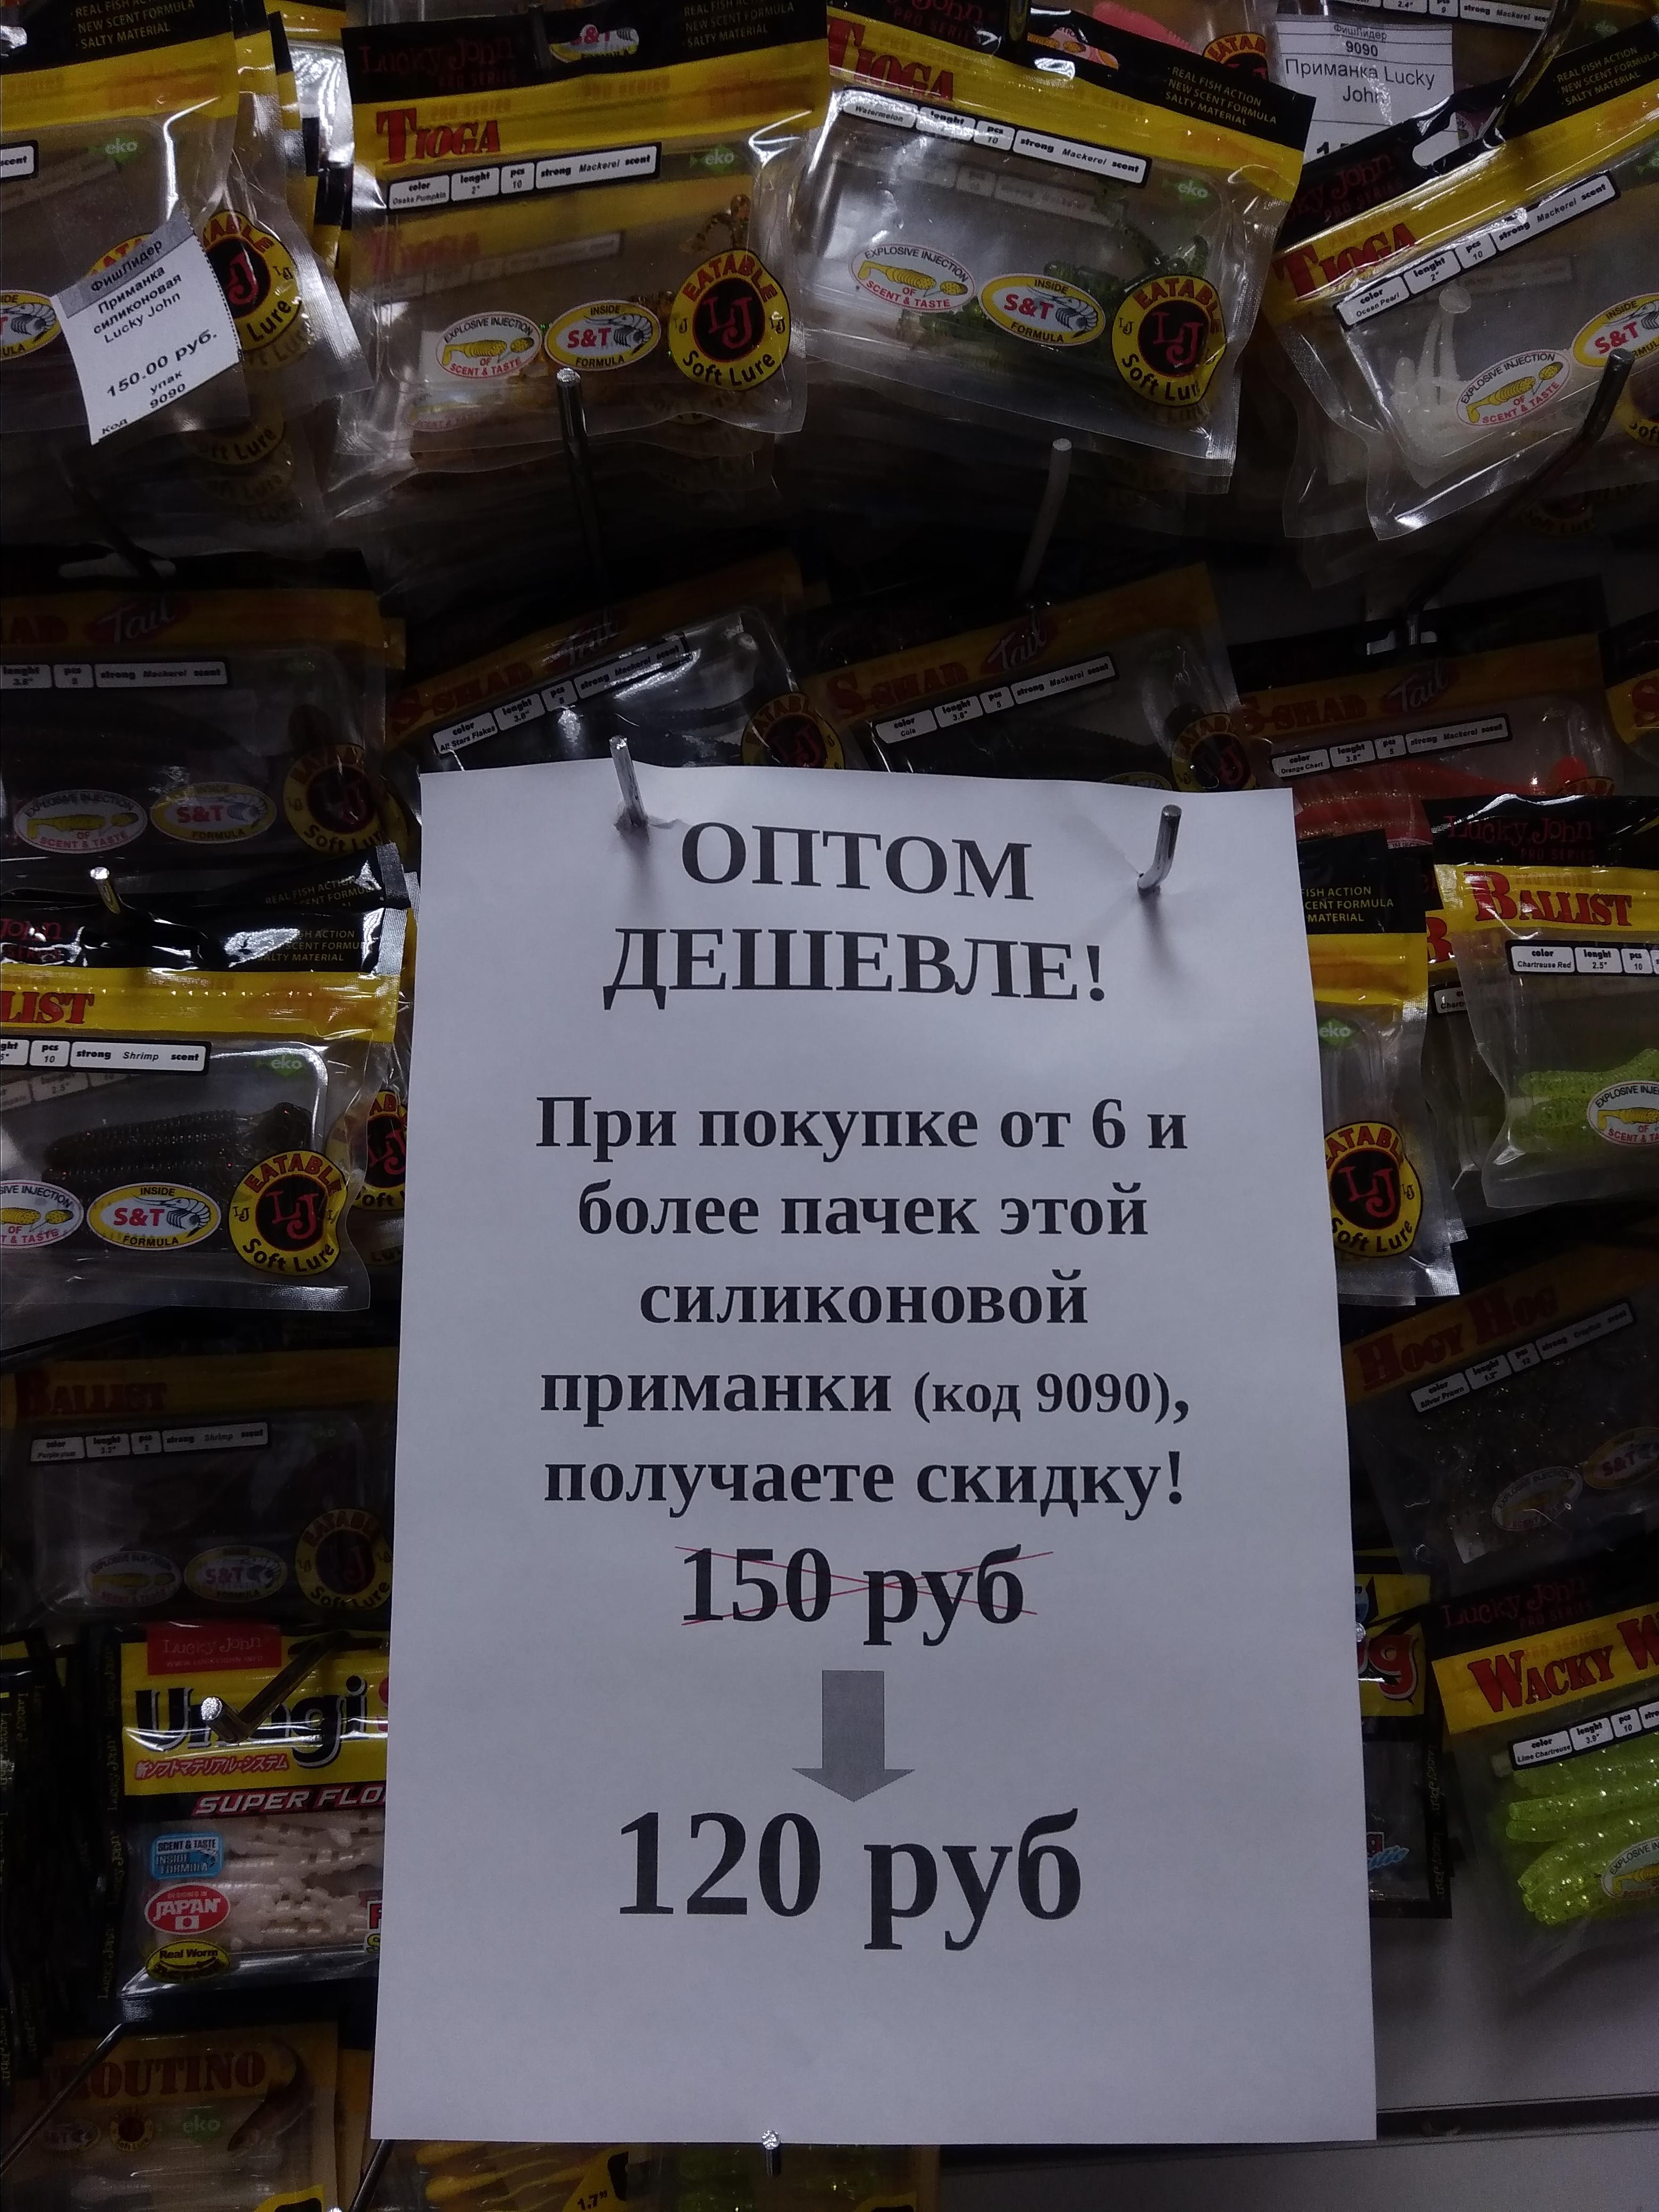 http://s3.uploads.ru/8Ku1A.jpg